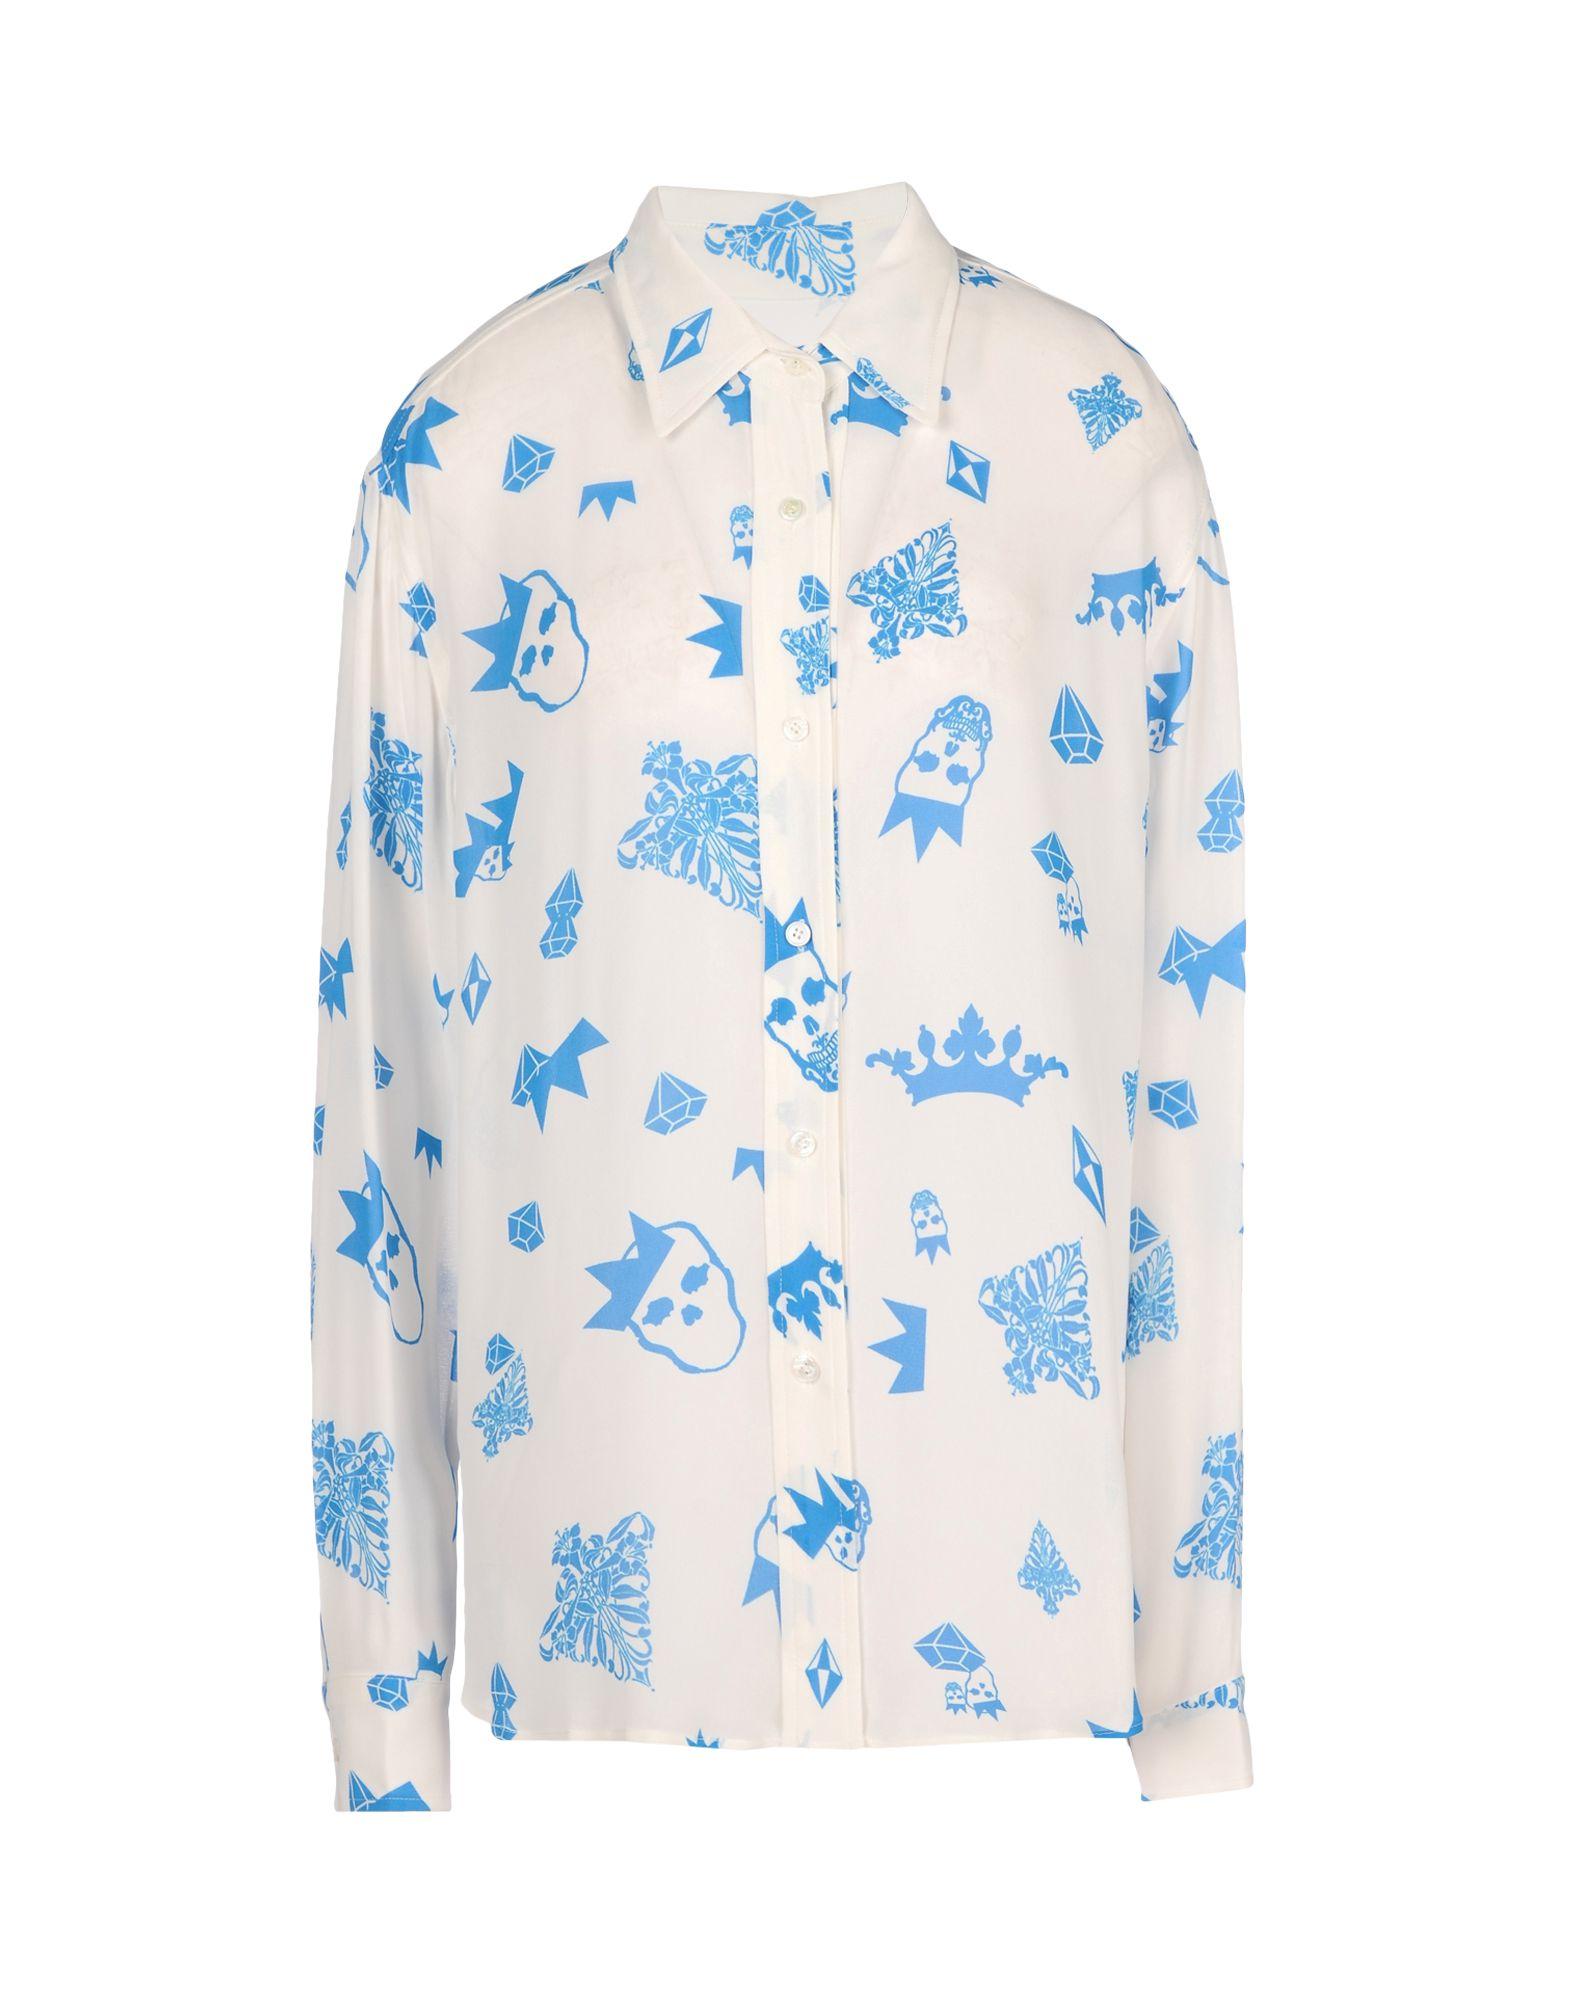 Camicie E Bluse Fantasia Lucky Chouette Donna - Acquista online su rgOFlRhf5